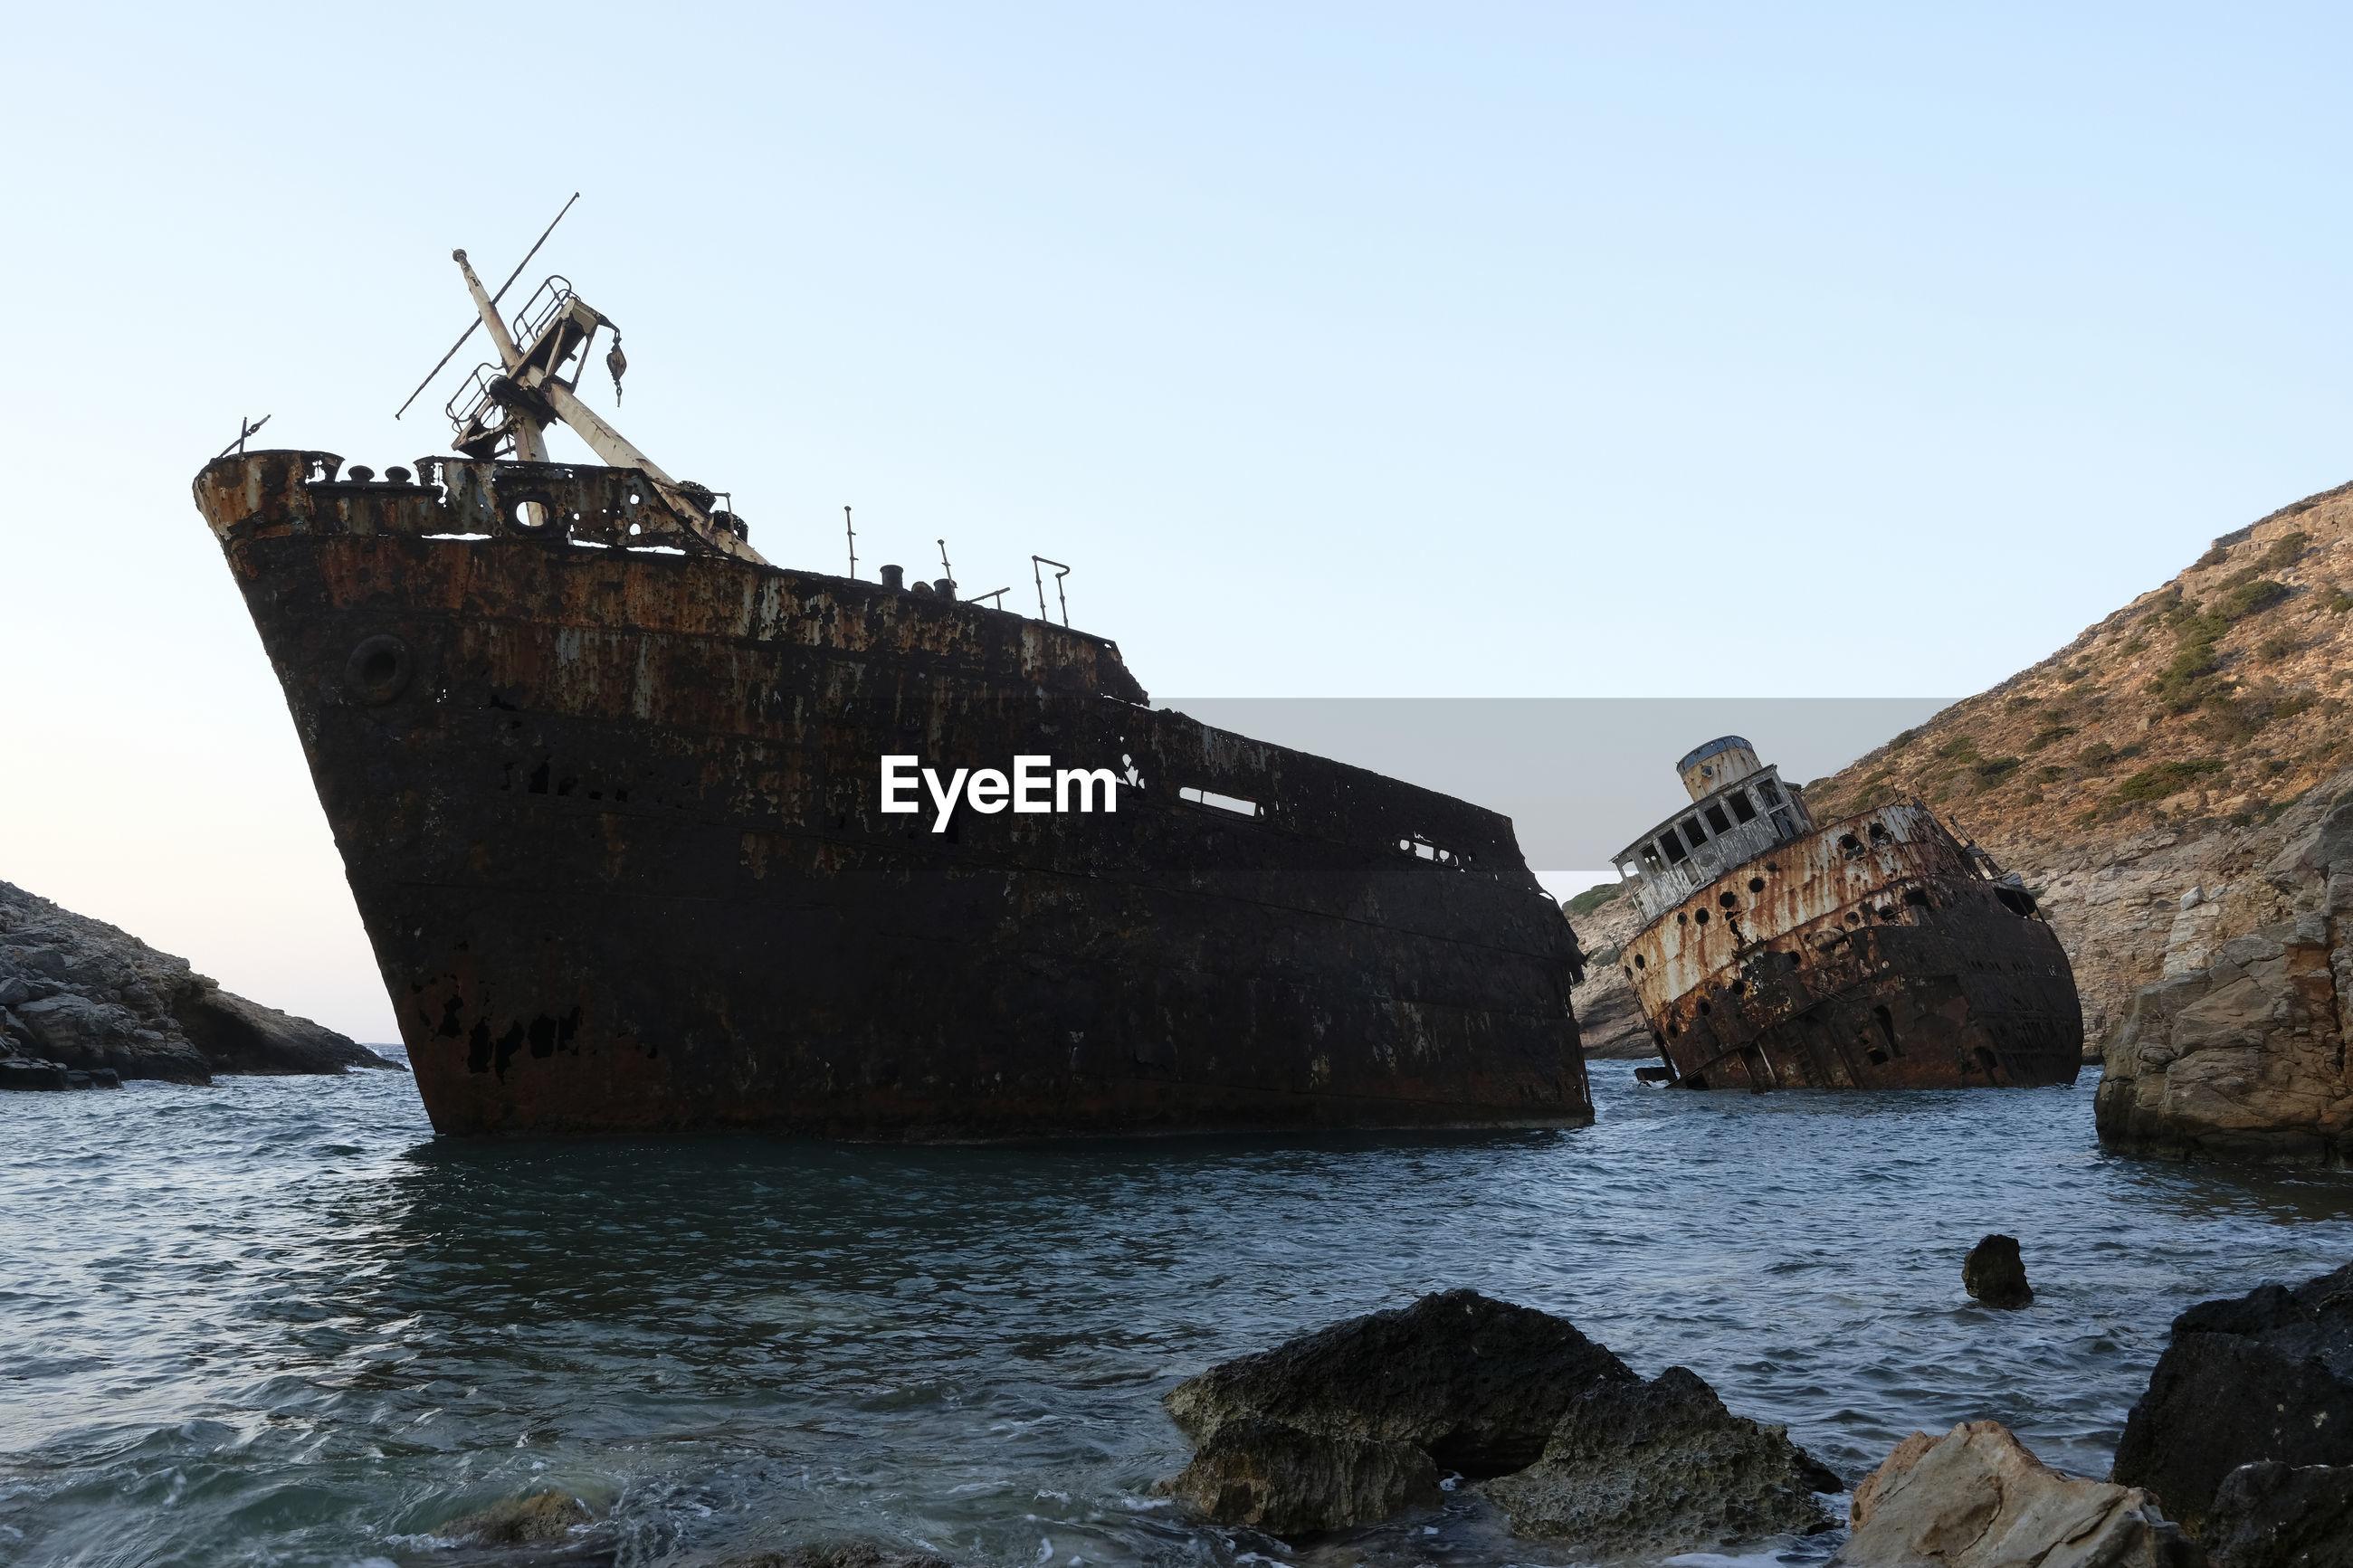 Shipwrecks in sea against clear sky